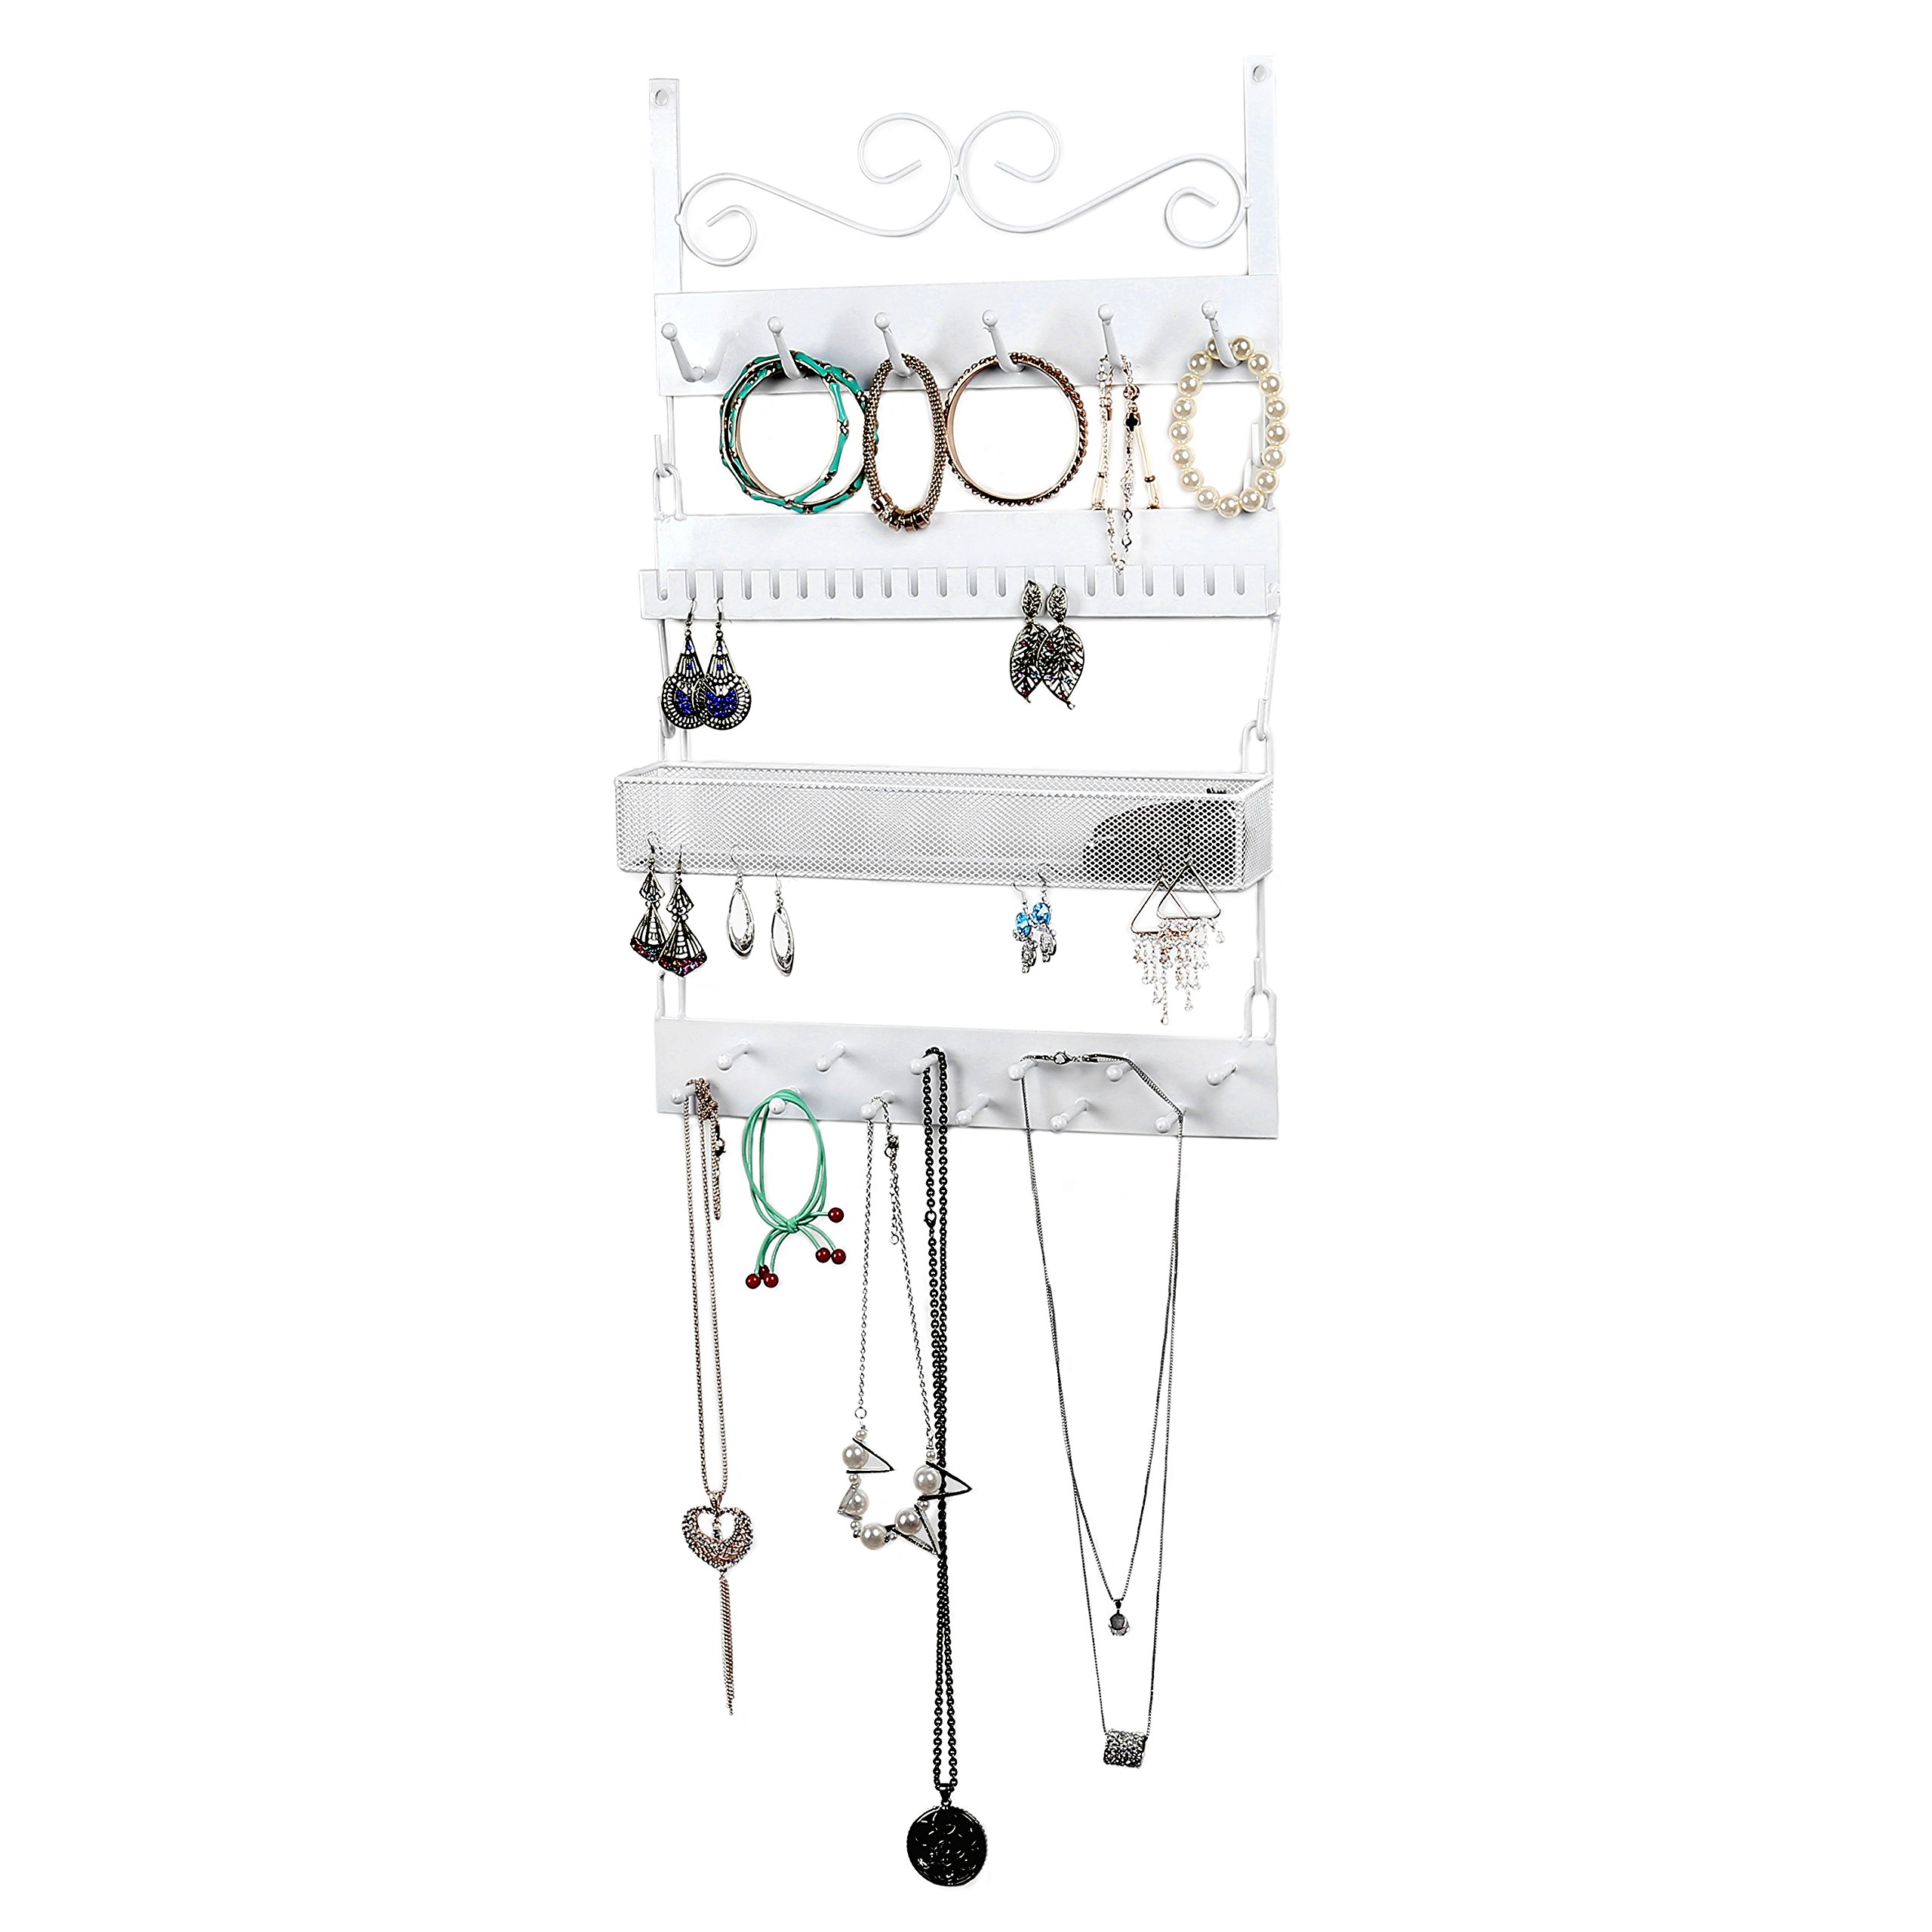 White Metal Wall-Mounted 4-Tier Jewelry Rack, 18 Hook Earrings, Rings, Necklaces, Bracelets Organizer